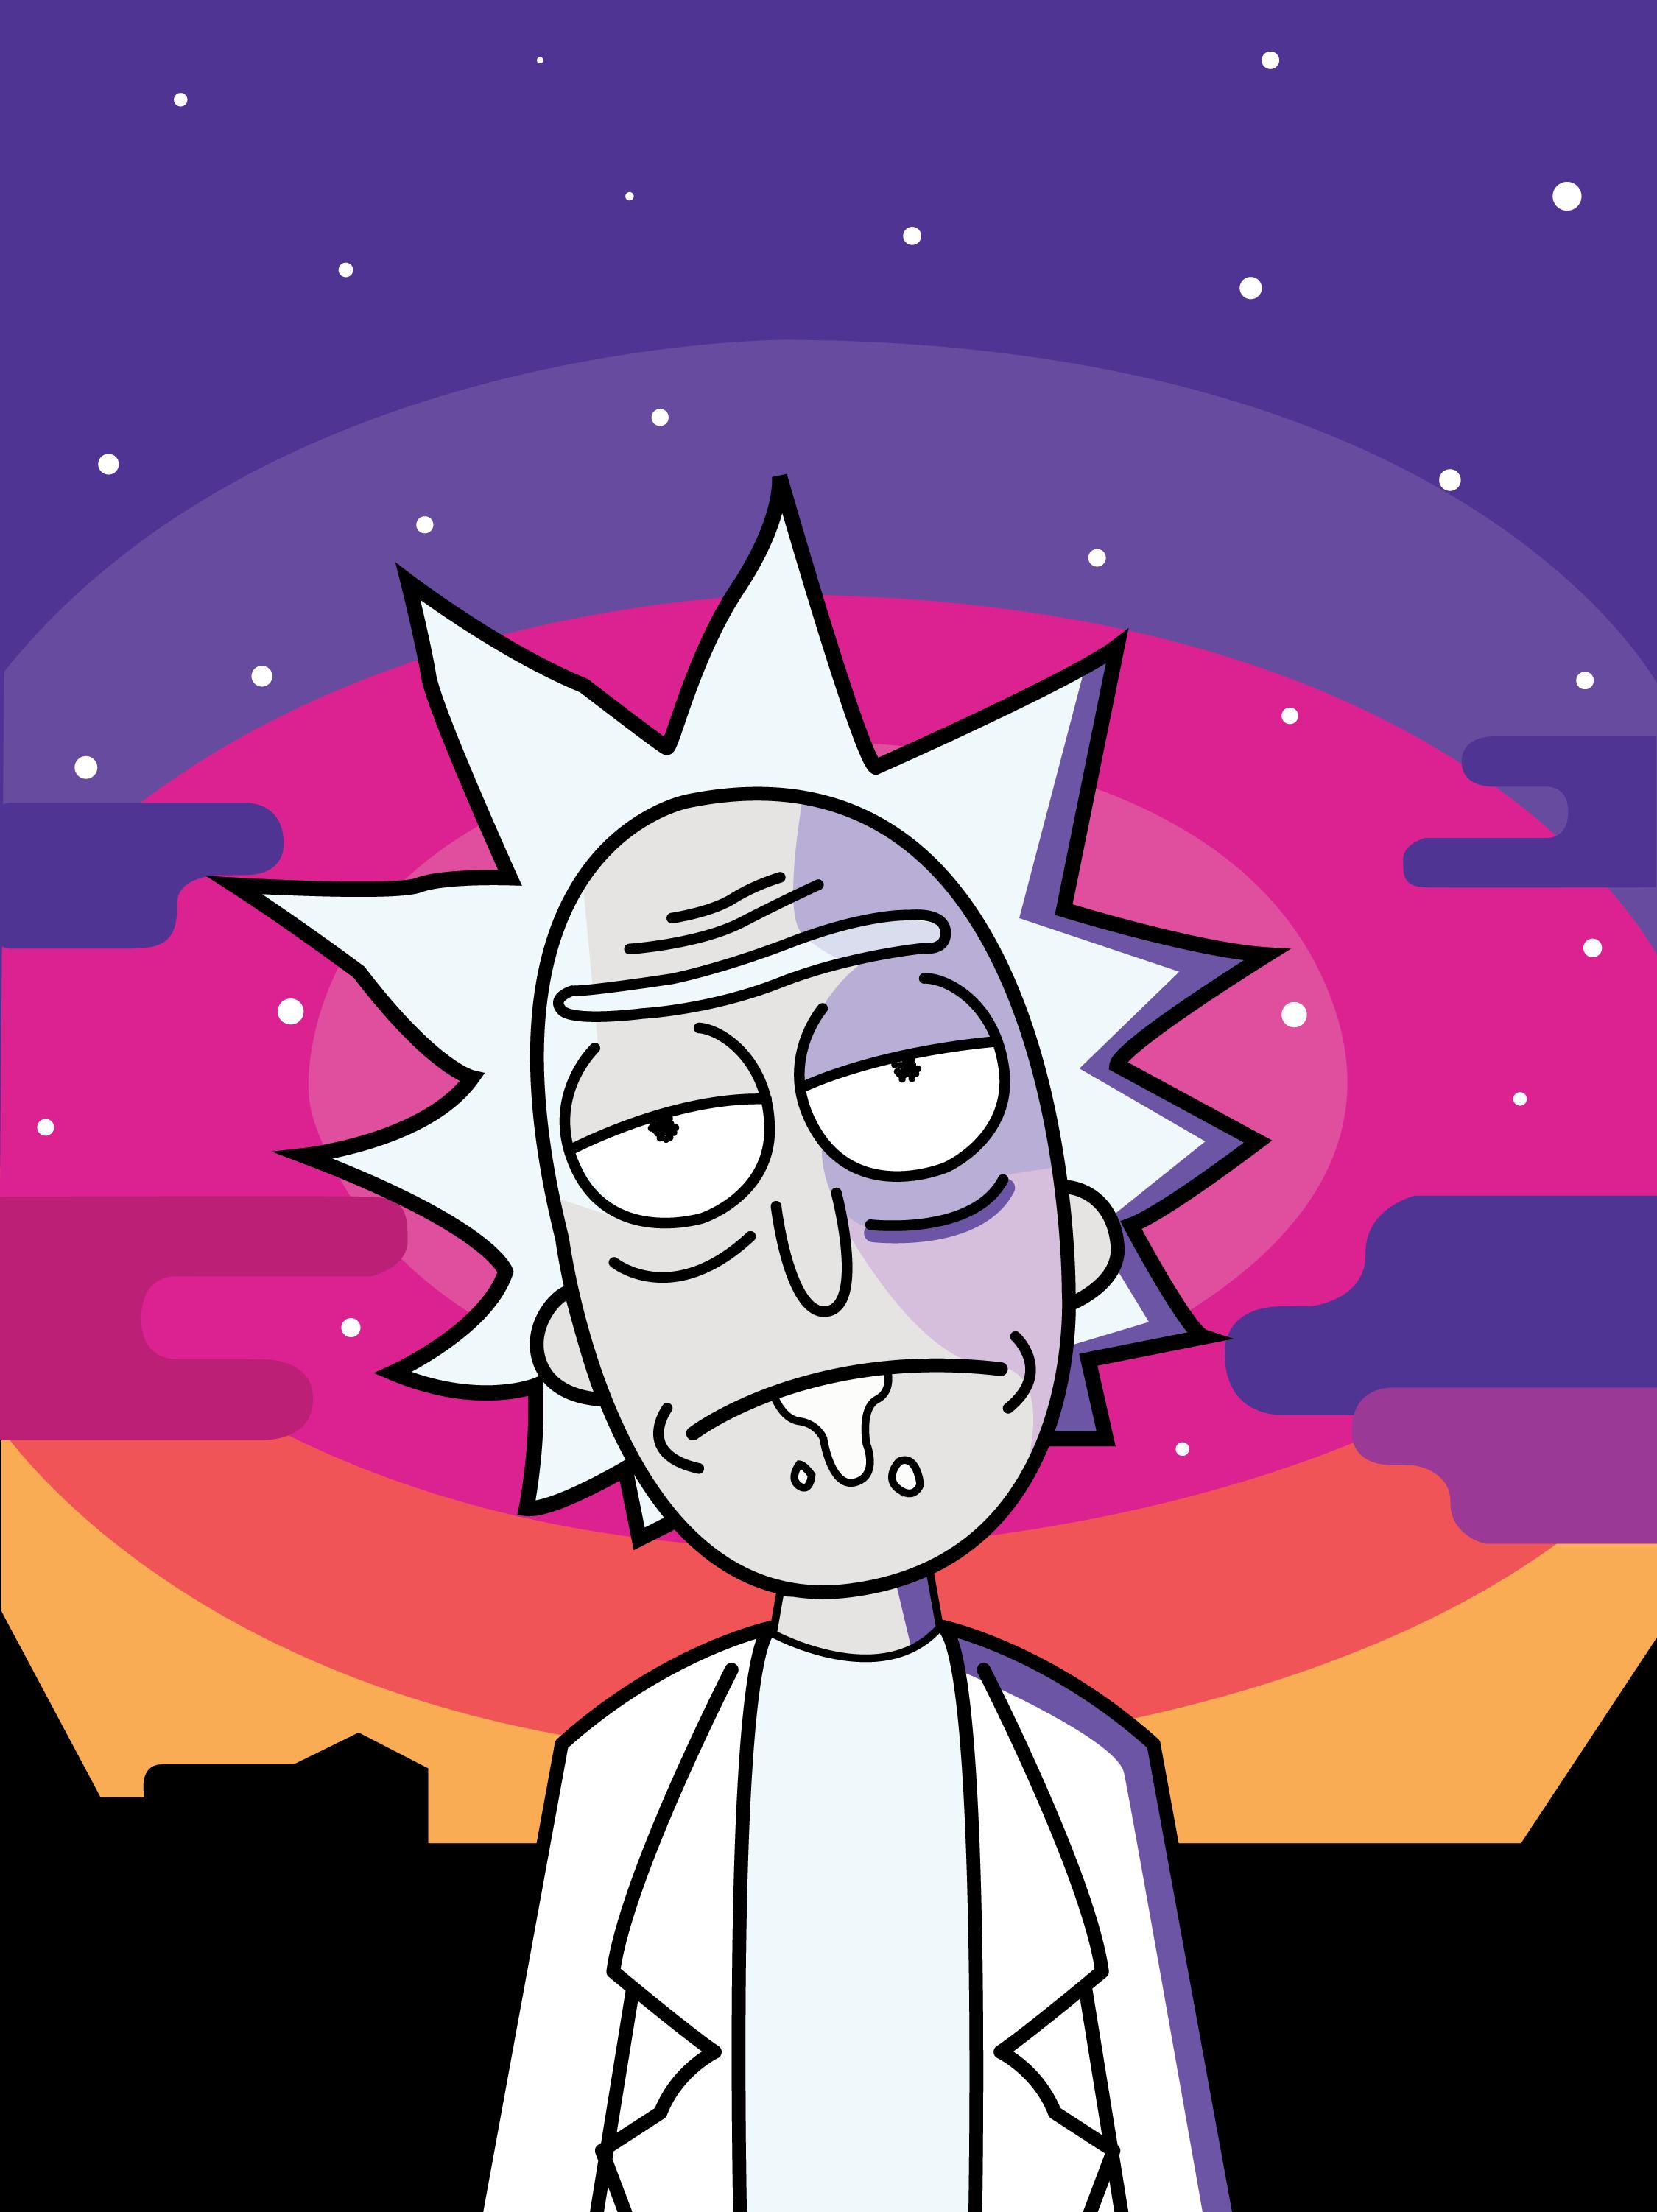 Rick And Morty Wallpaper Reddit